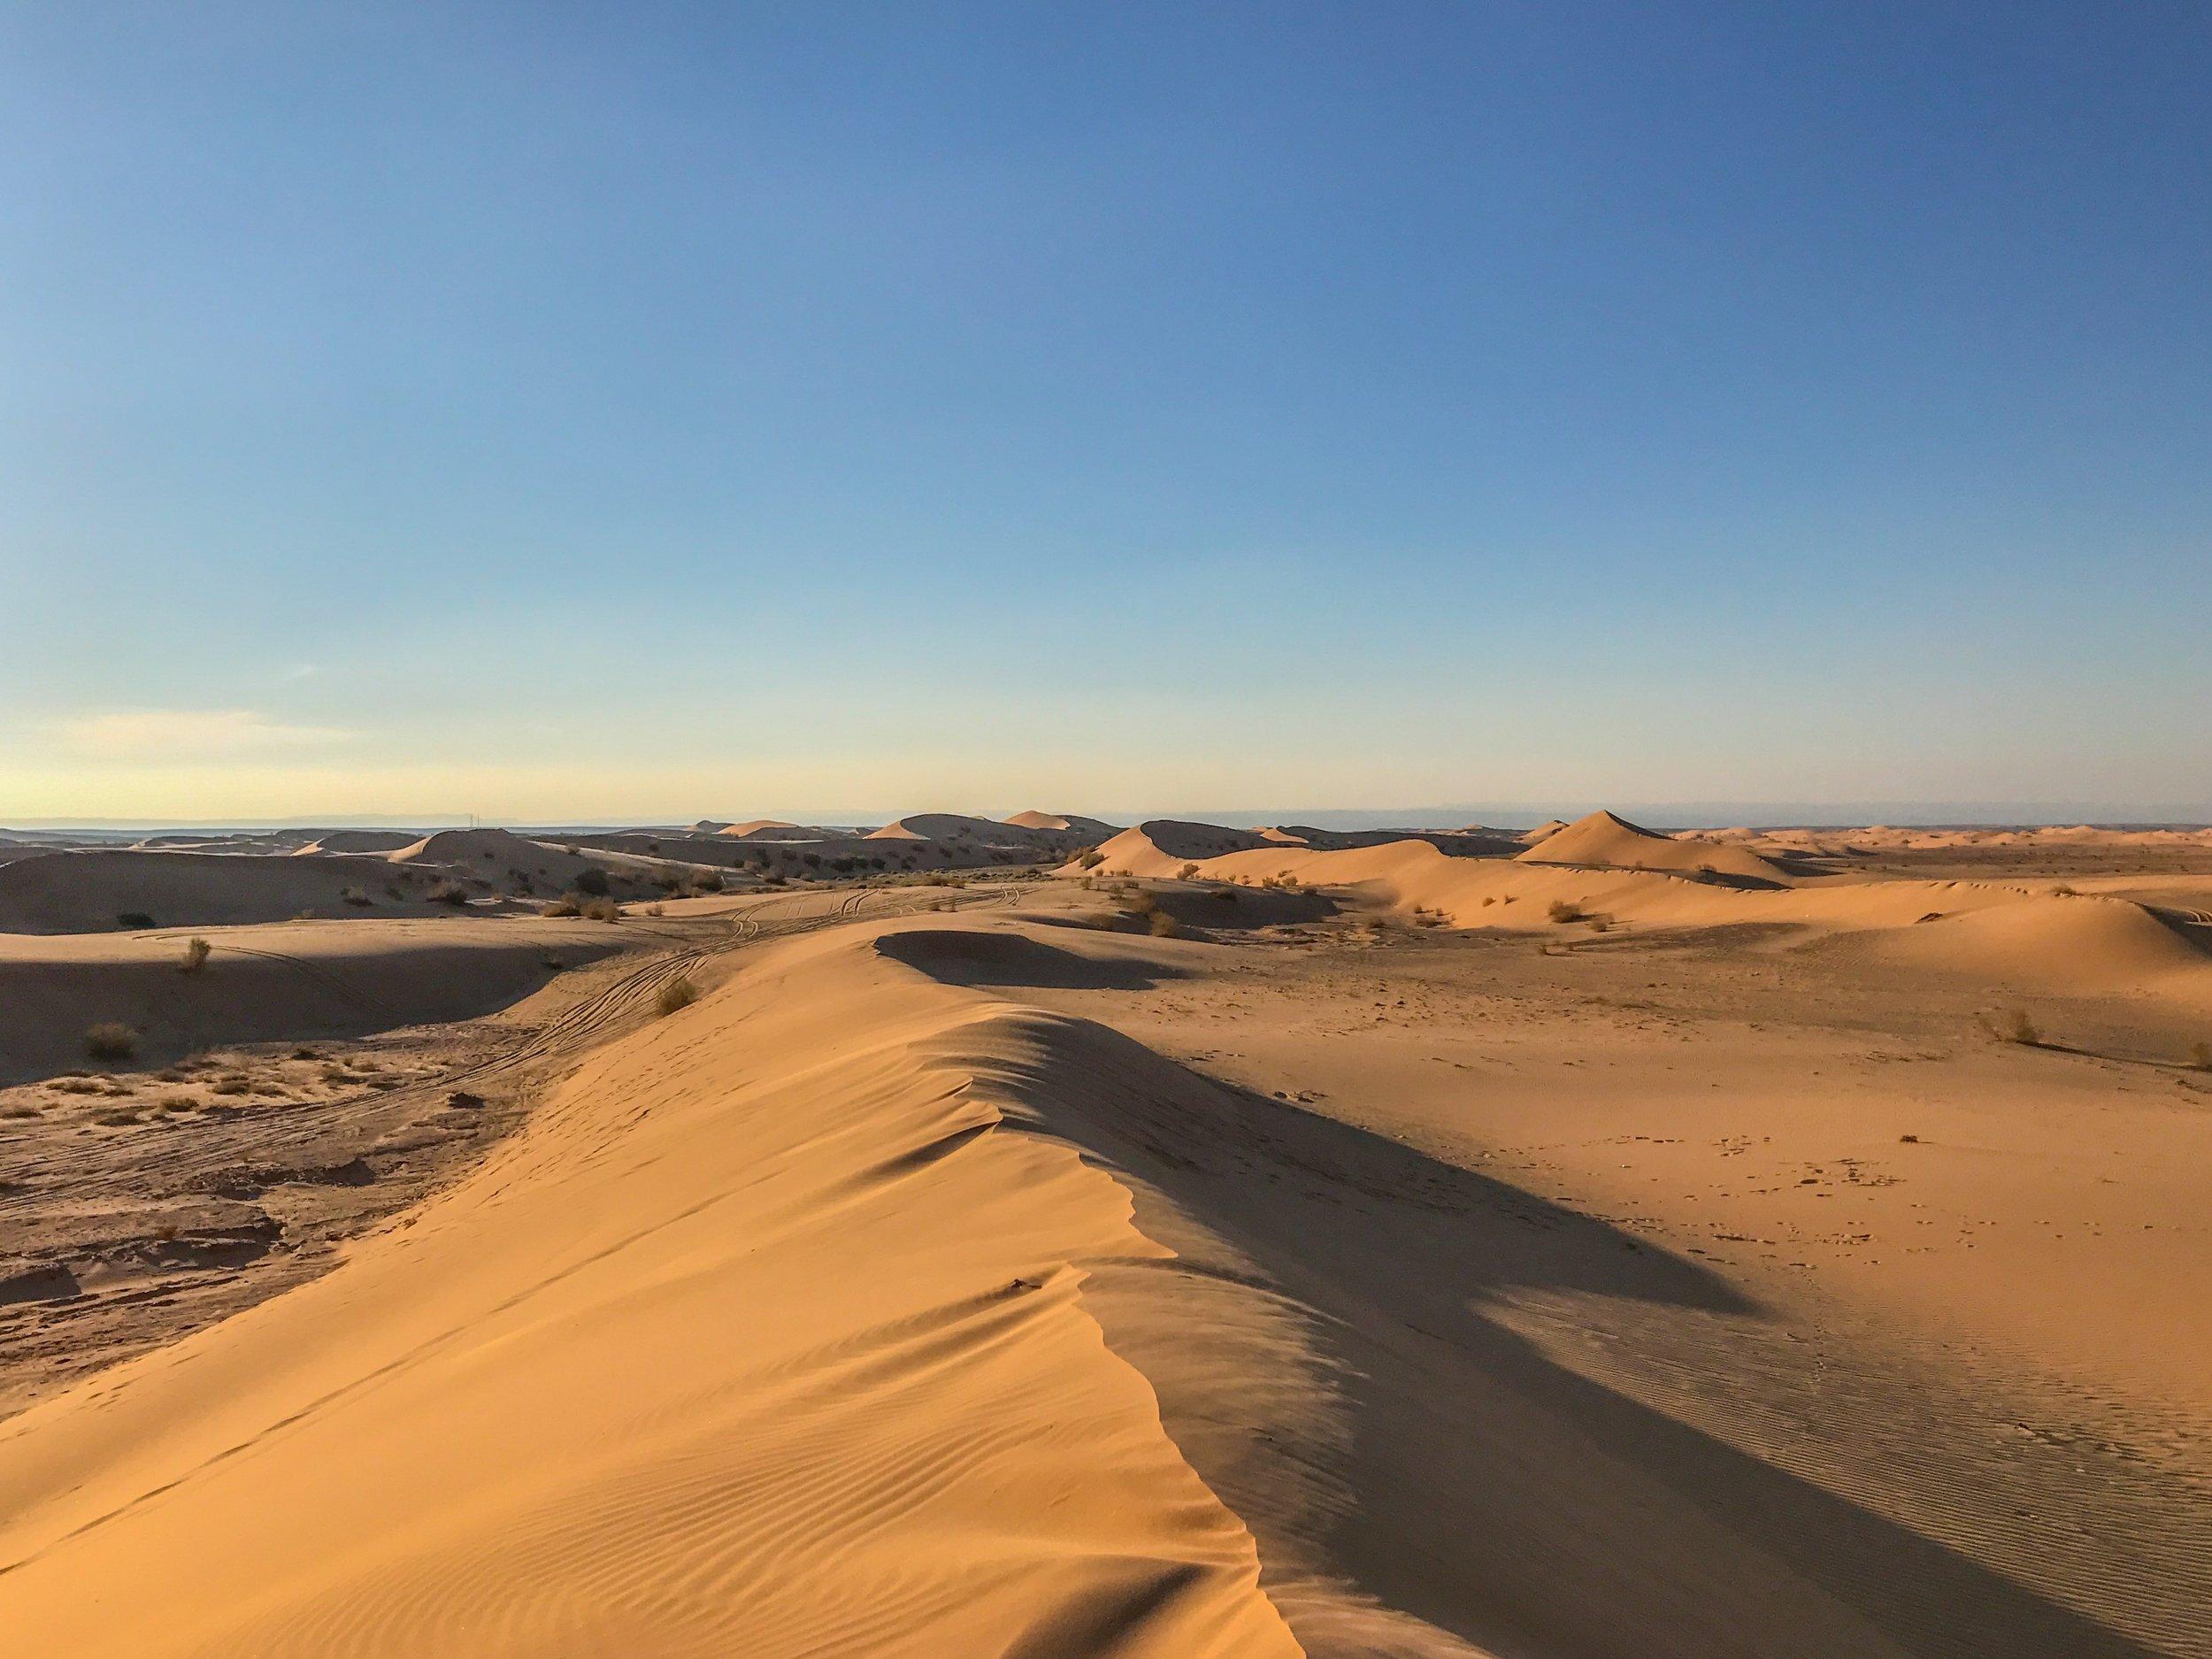 Sunset escape to Wadi Araba desert